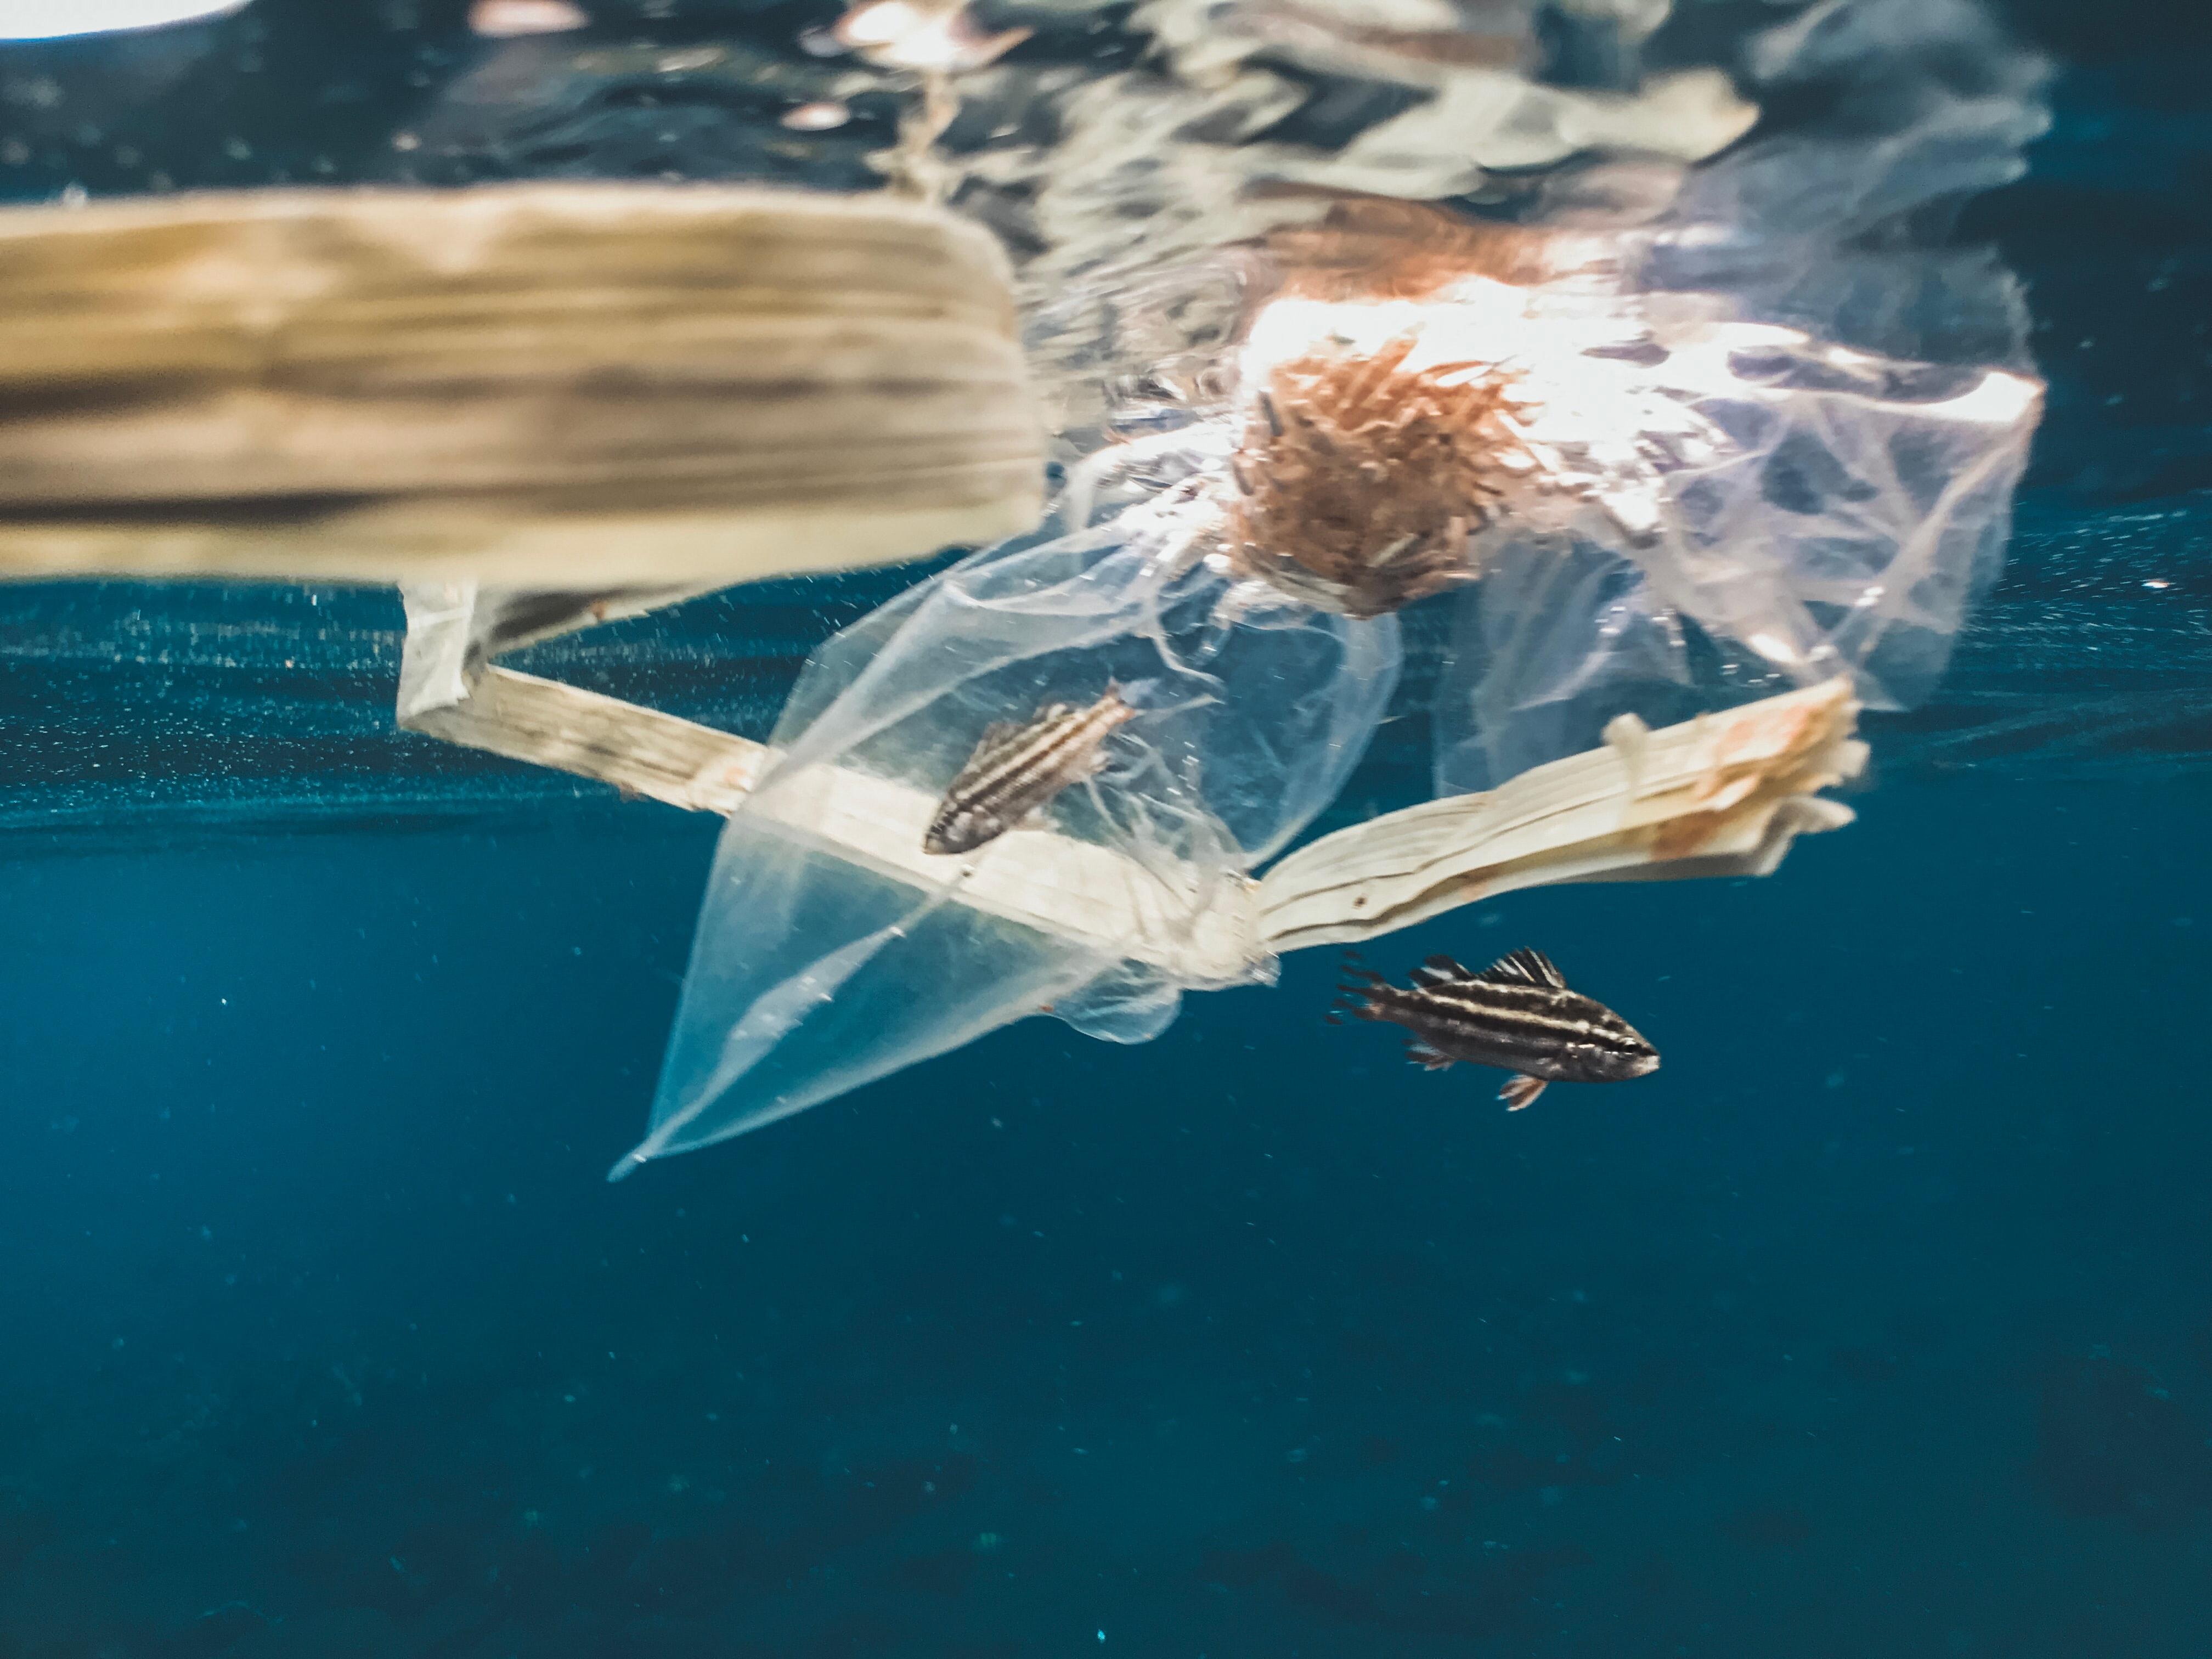 Plastic in the Oceans